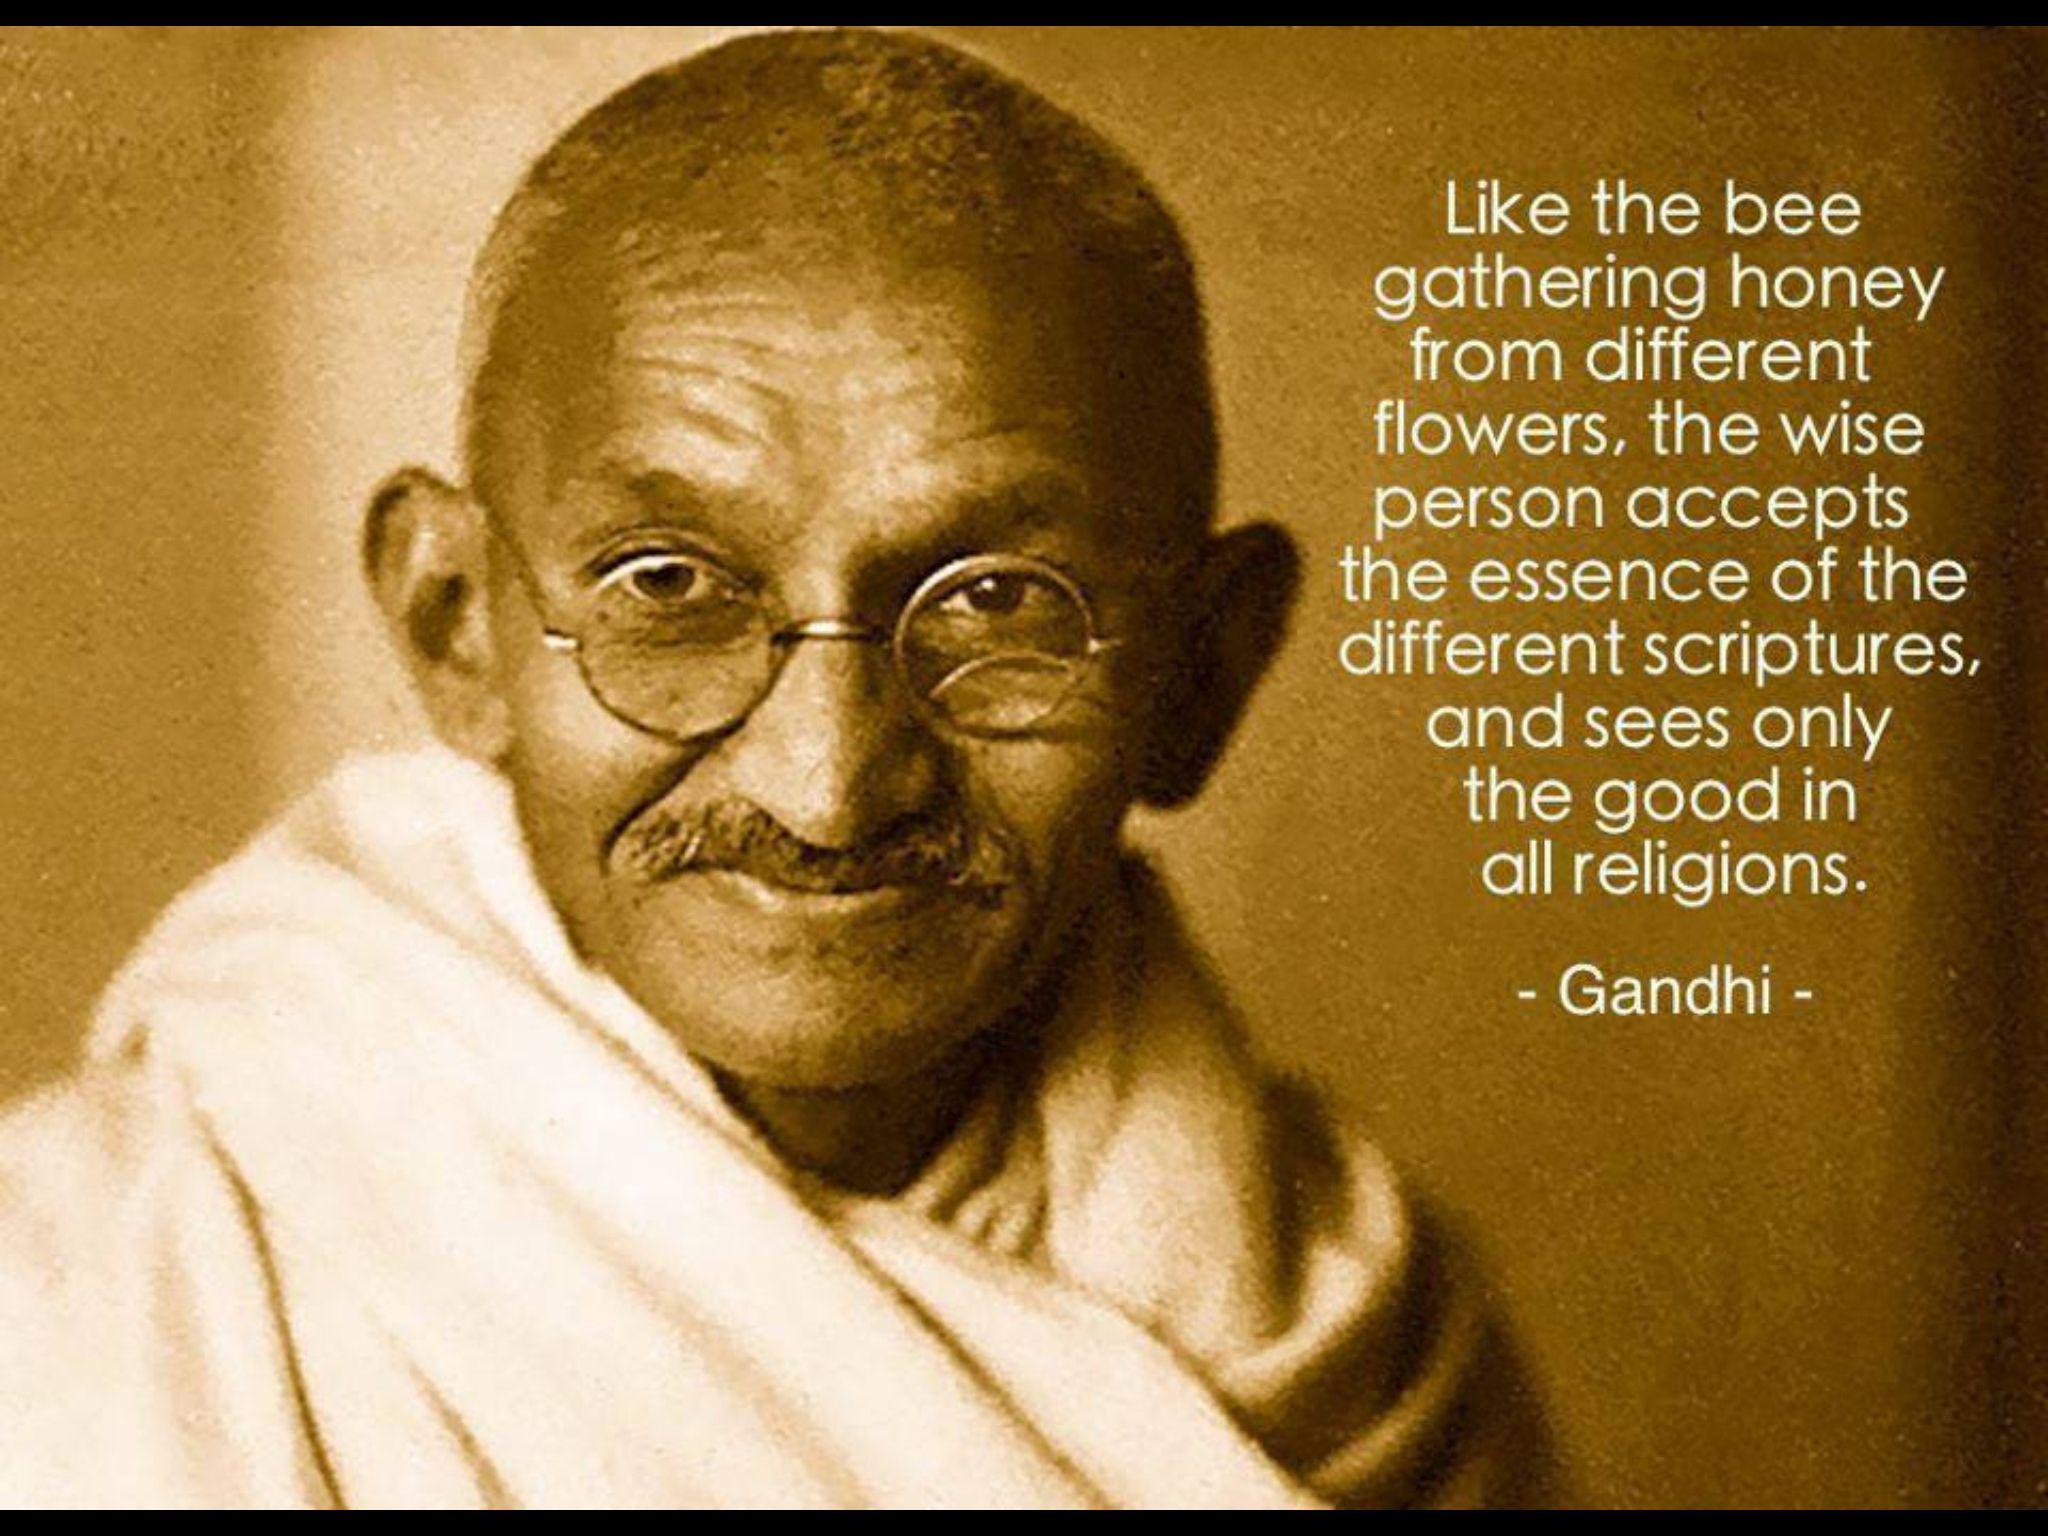 Mahatma Gandhi Wisdom All Religions Mahatma Gandhi - Gandhi religion